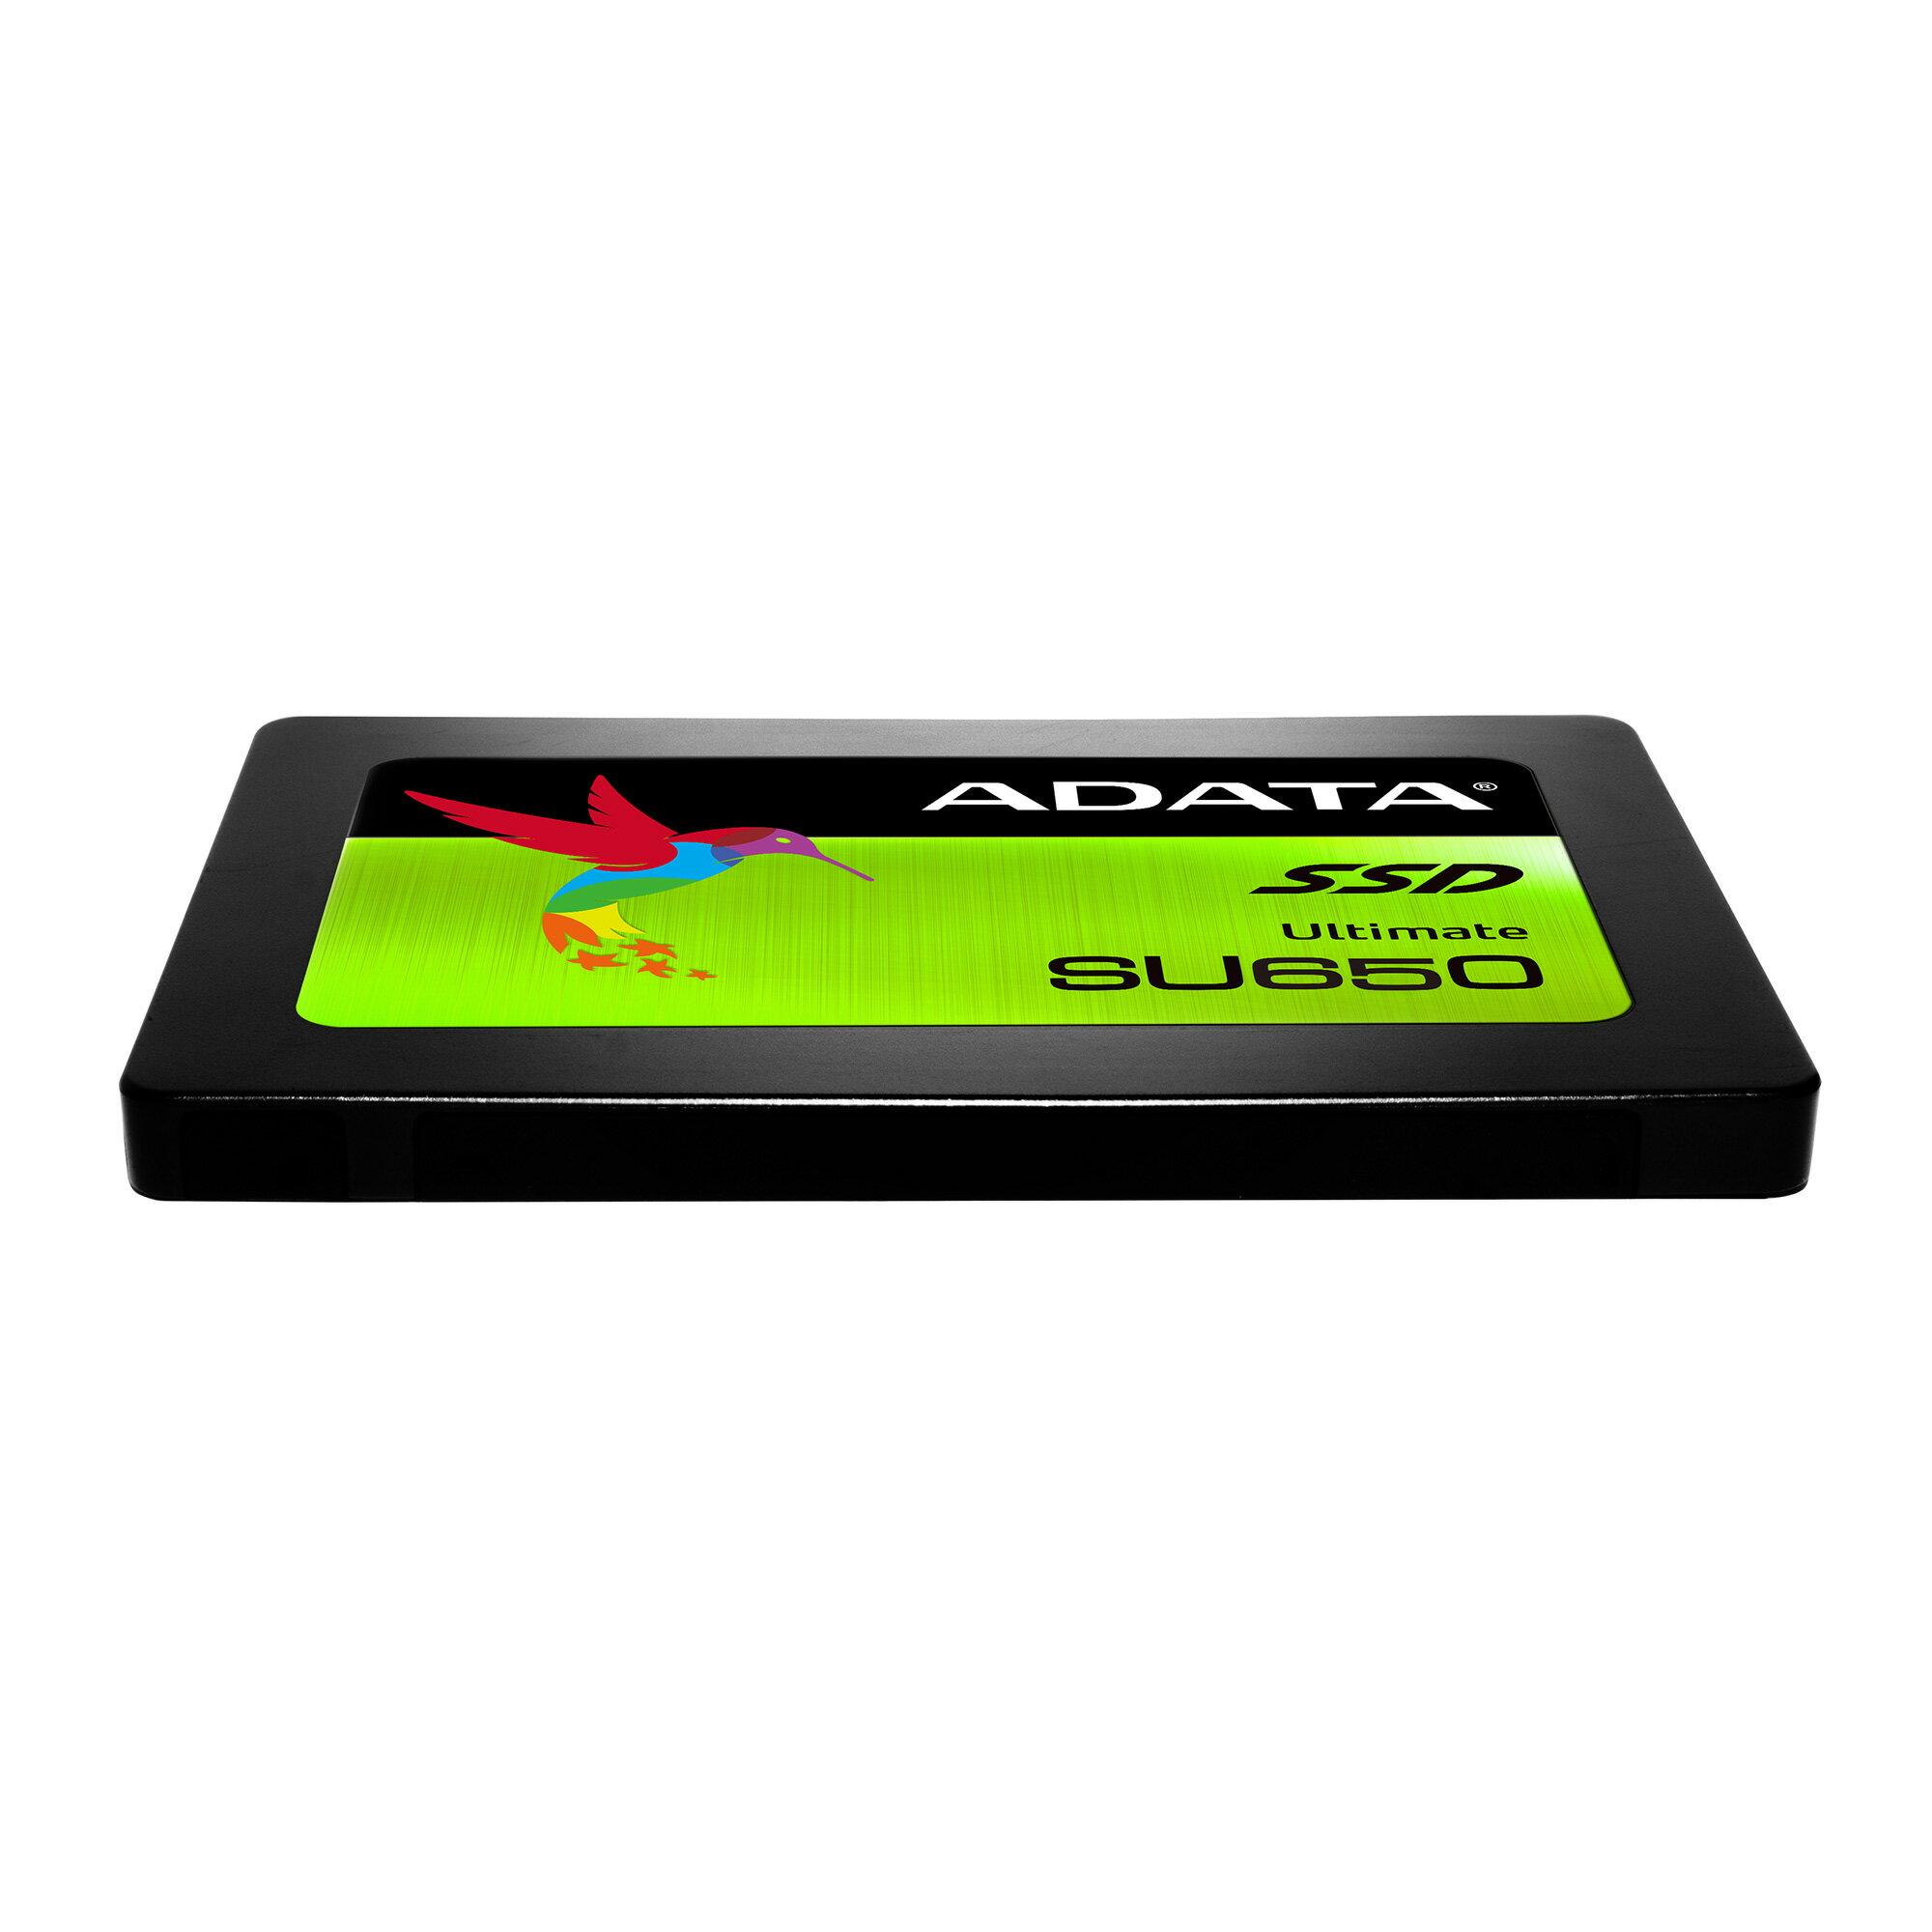 "ADATA Ultimate SU650 3D NAND 2.5"" 480 GB SSD (ASU650SS-480GT-C) 3"